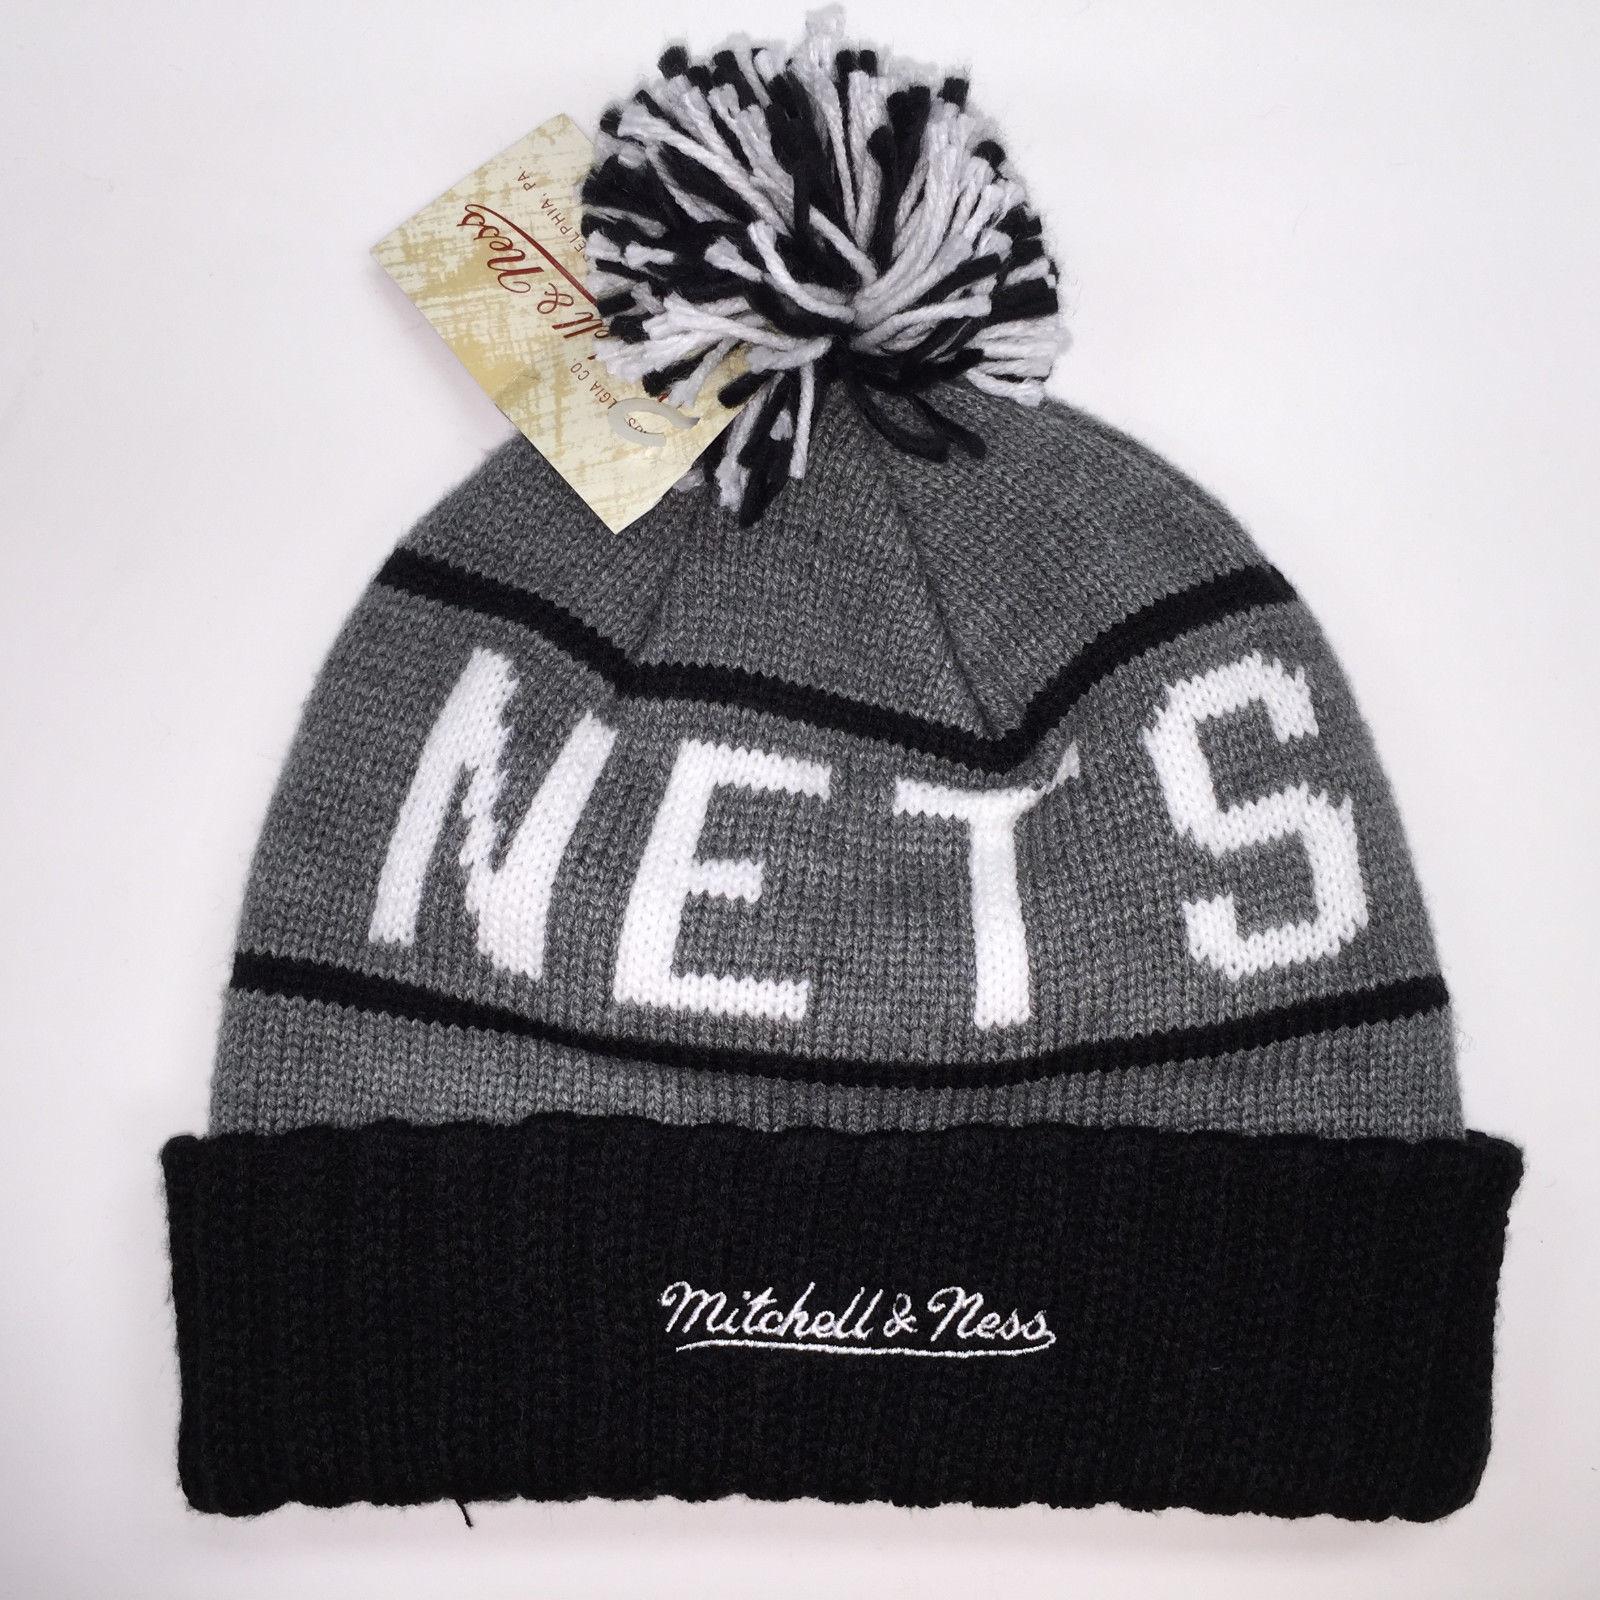 Mitchell & Ness NBA Brooklyn Nets High 5 Cuffed Knit Beanie 10093